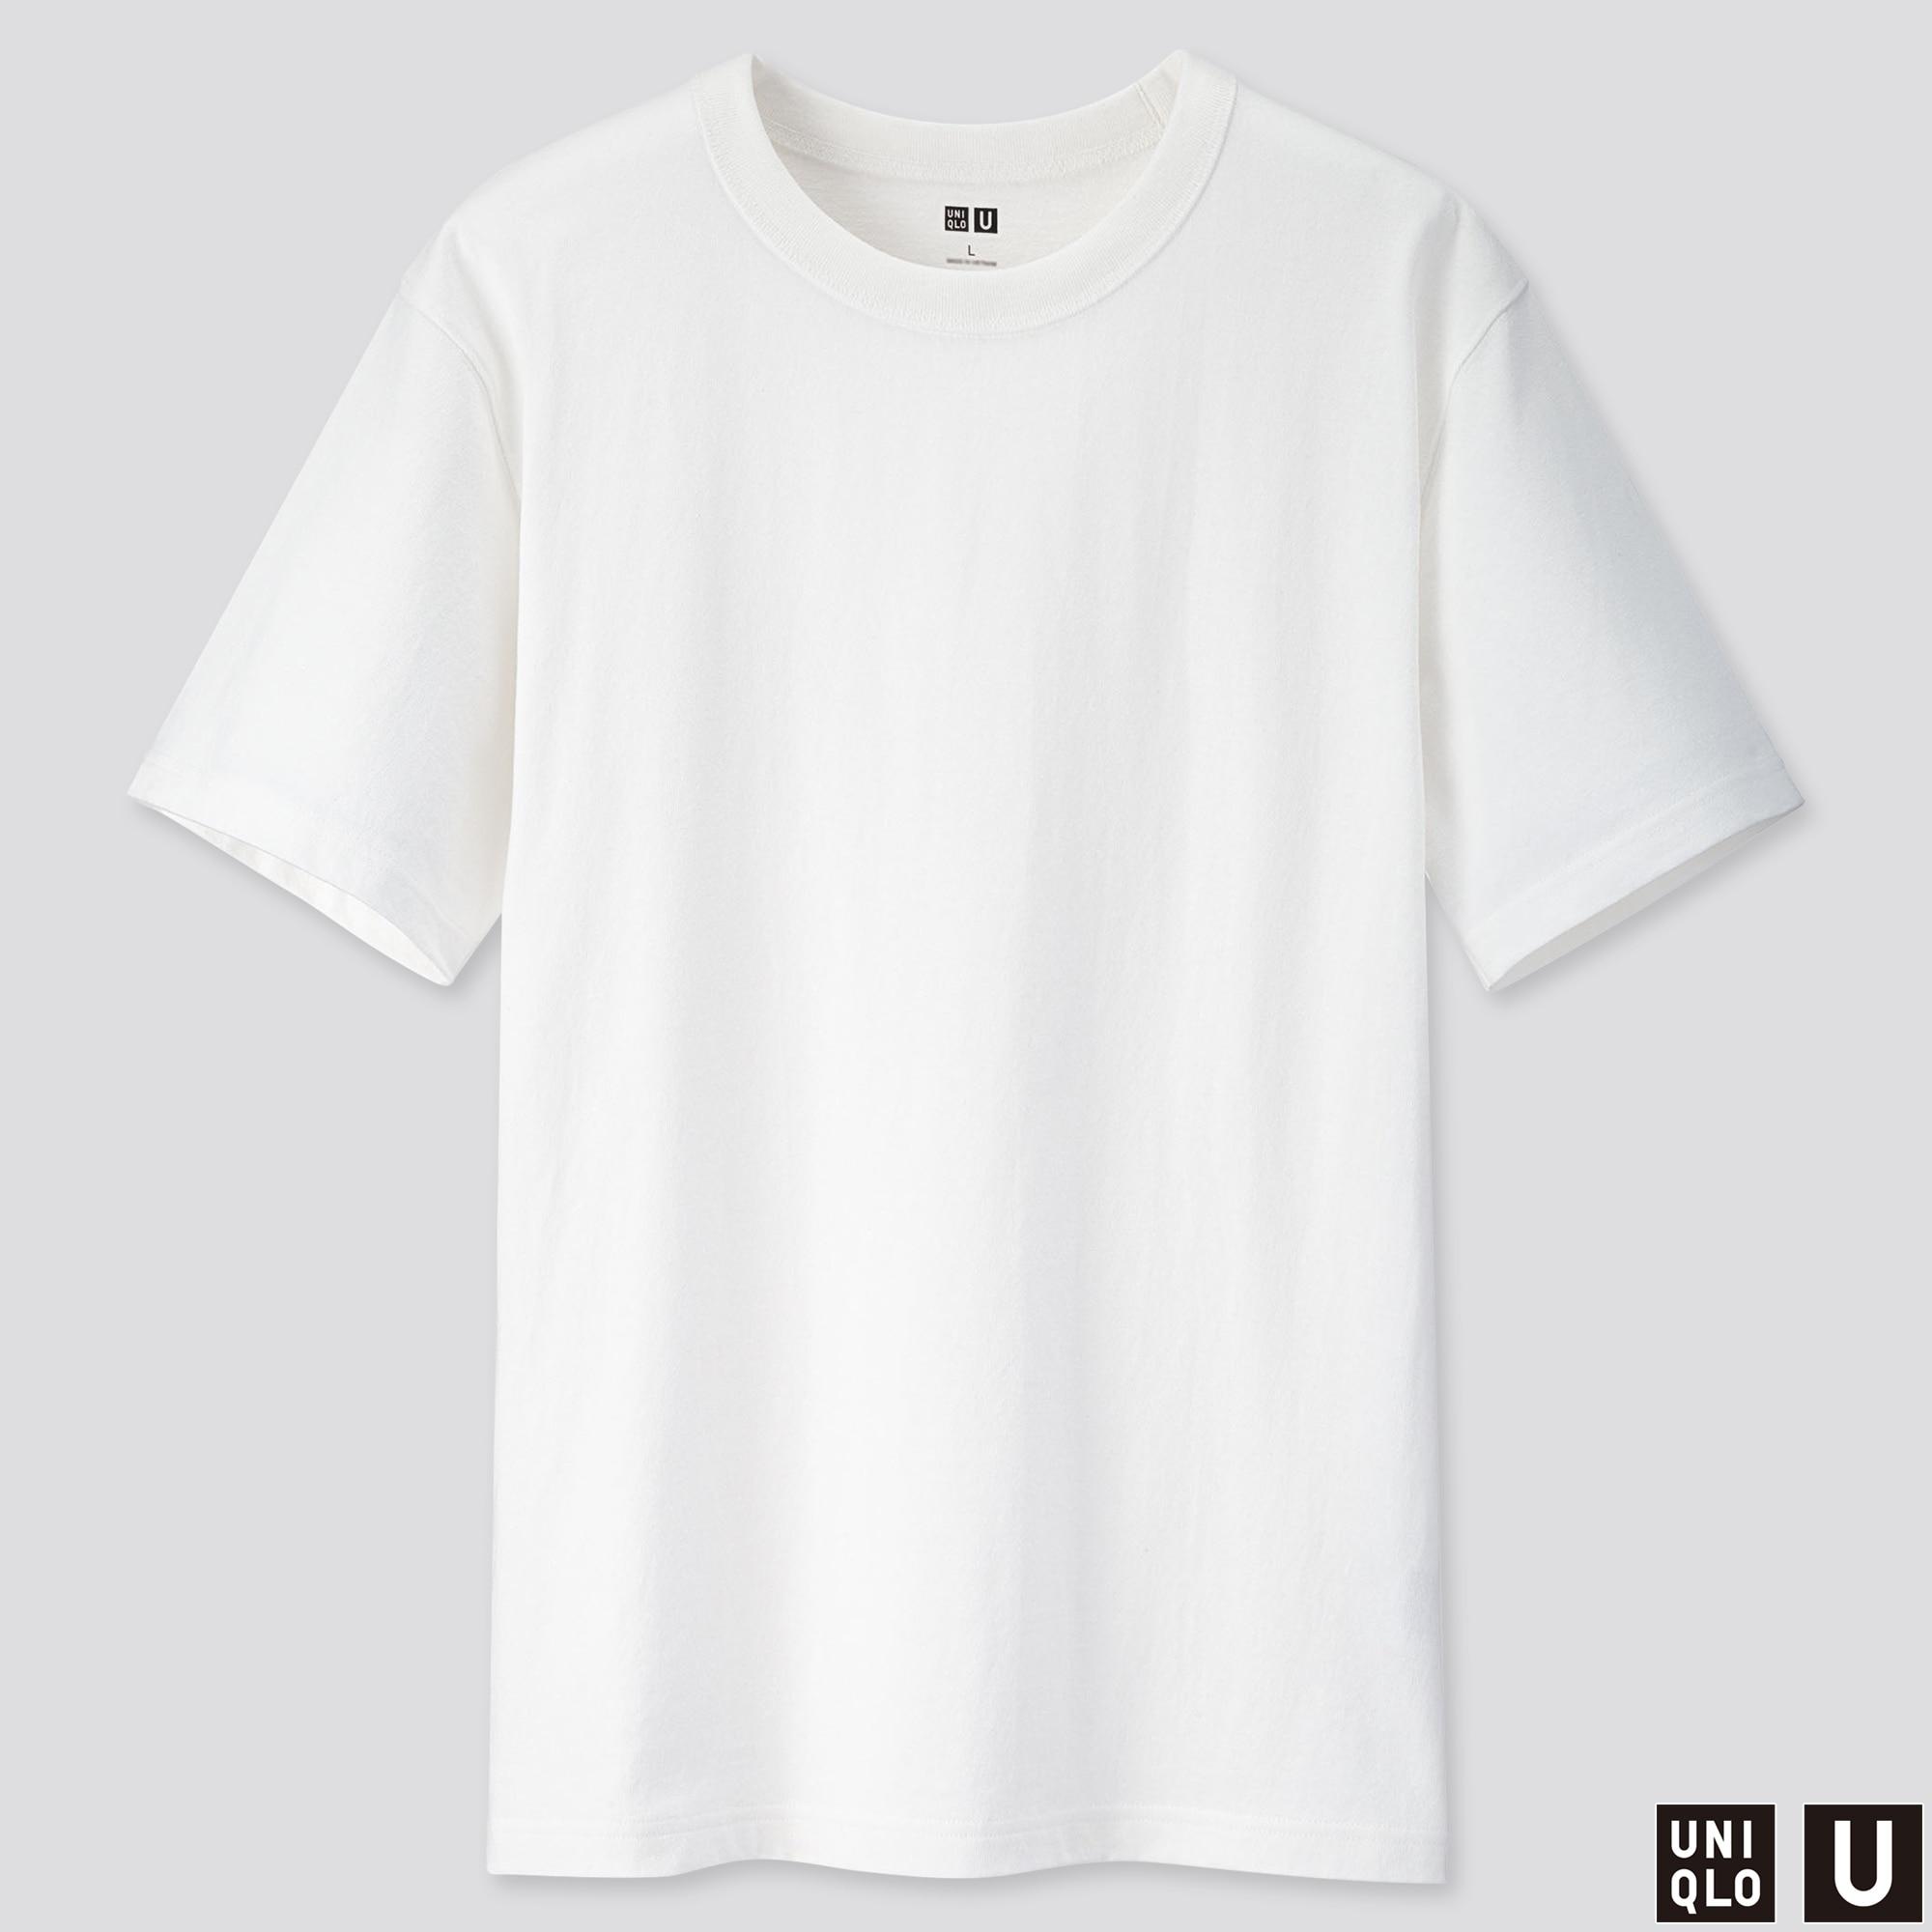 46 NEW RRP £28 White Stuff Polo Neck Jersey Tee